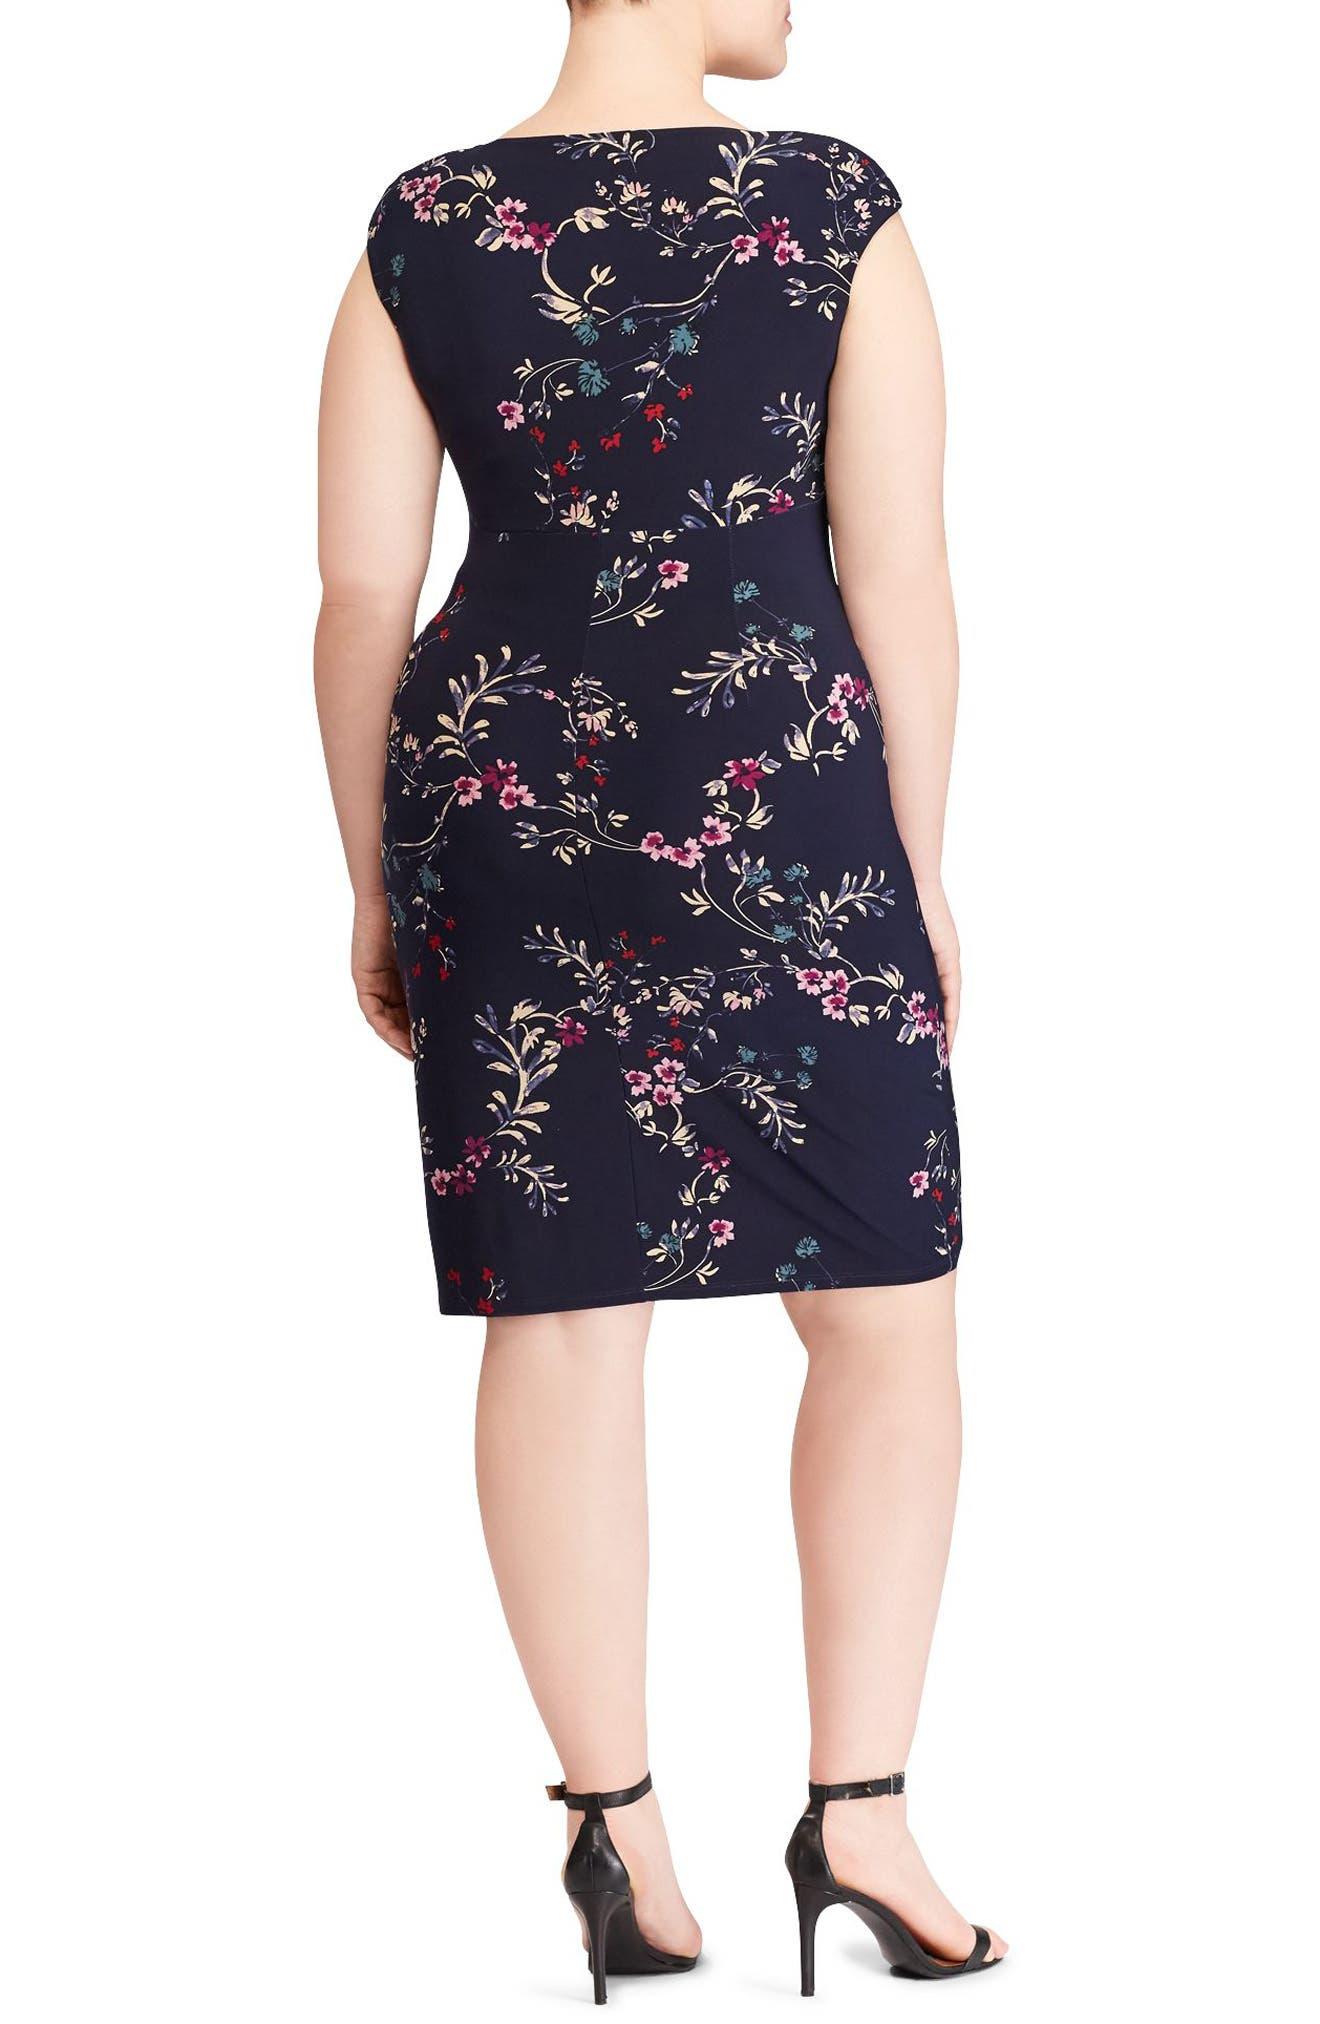 Adara Floral Jersey Dress,                             Alternate thumbnail 2, color,                             410